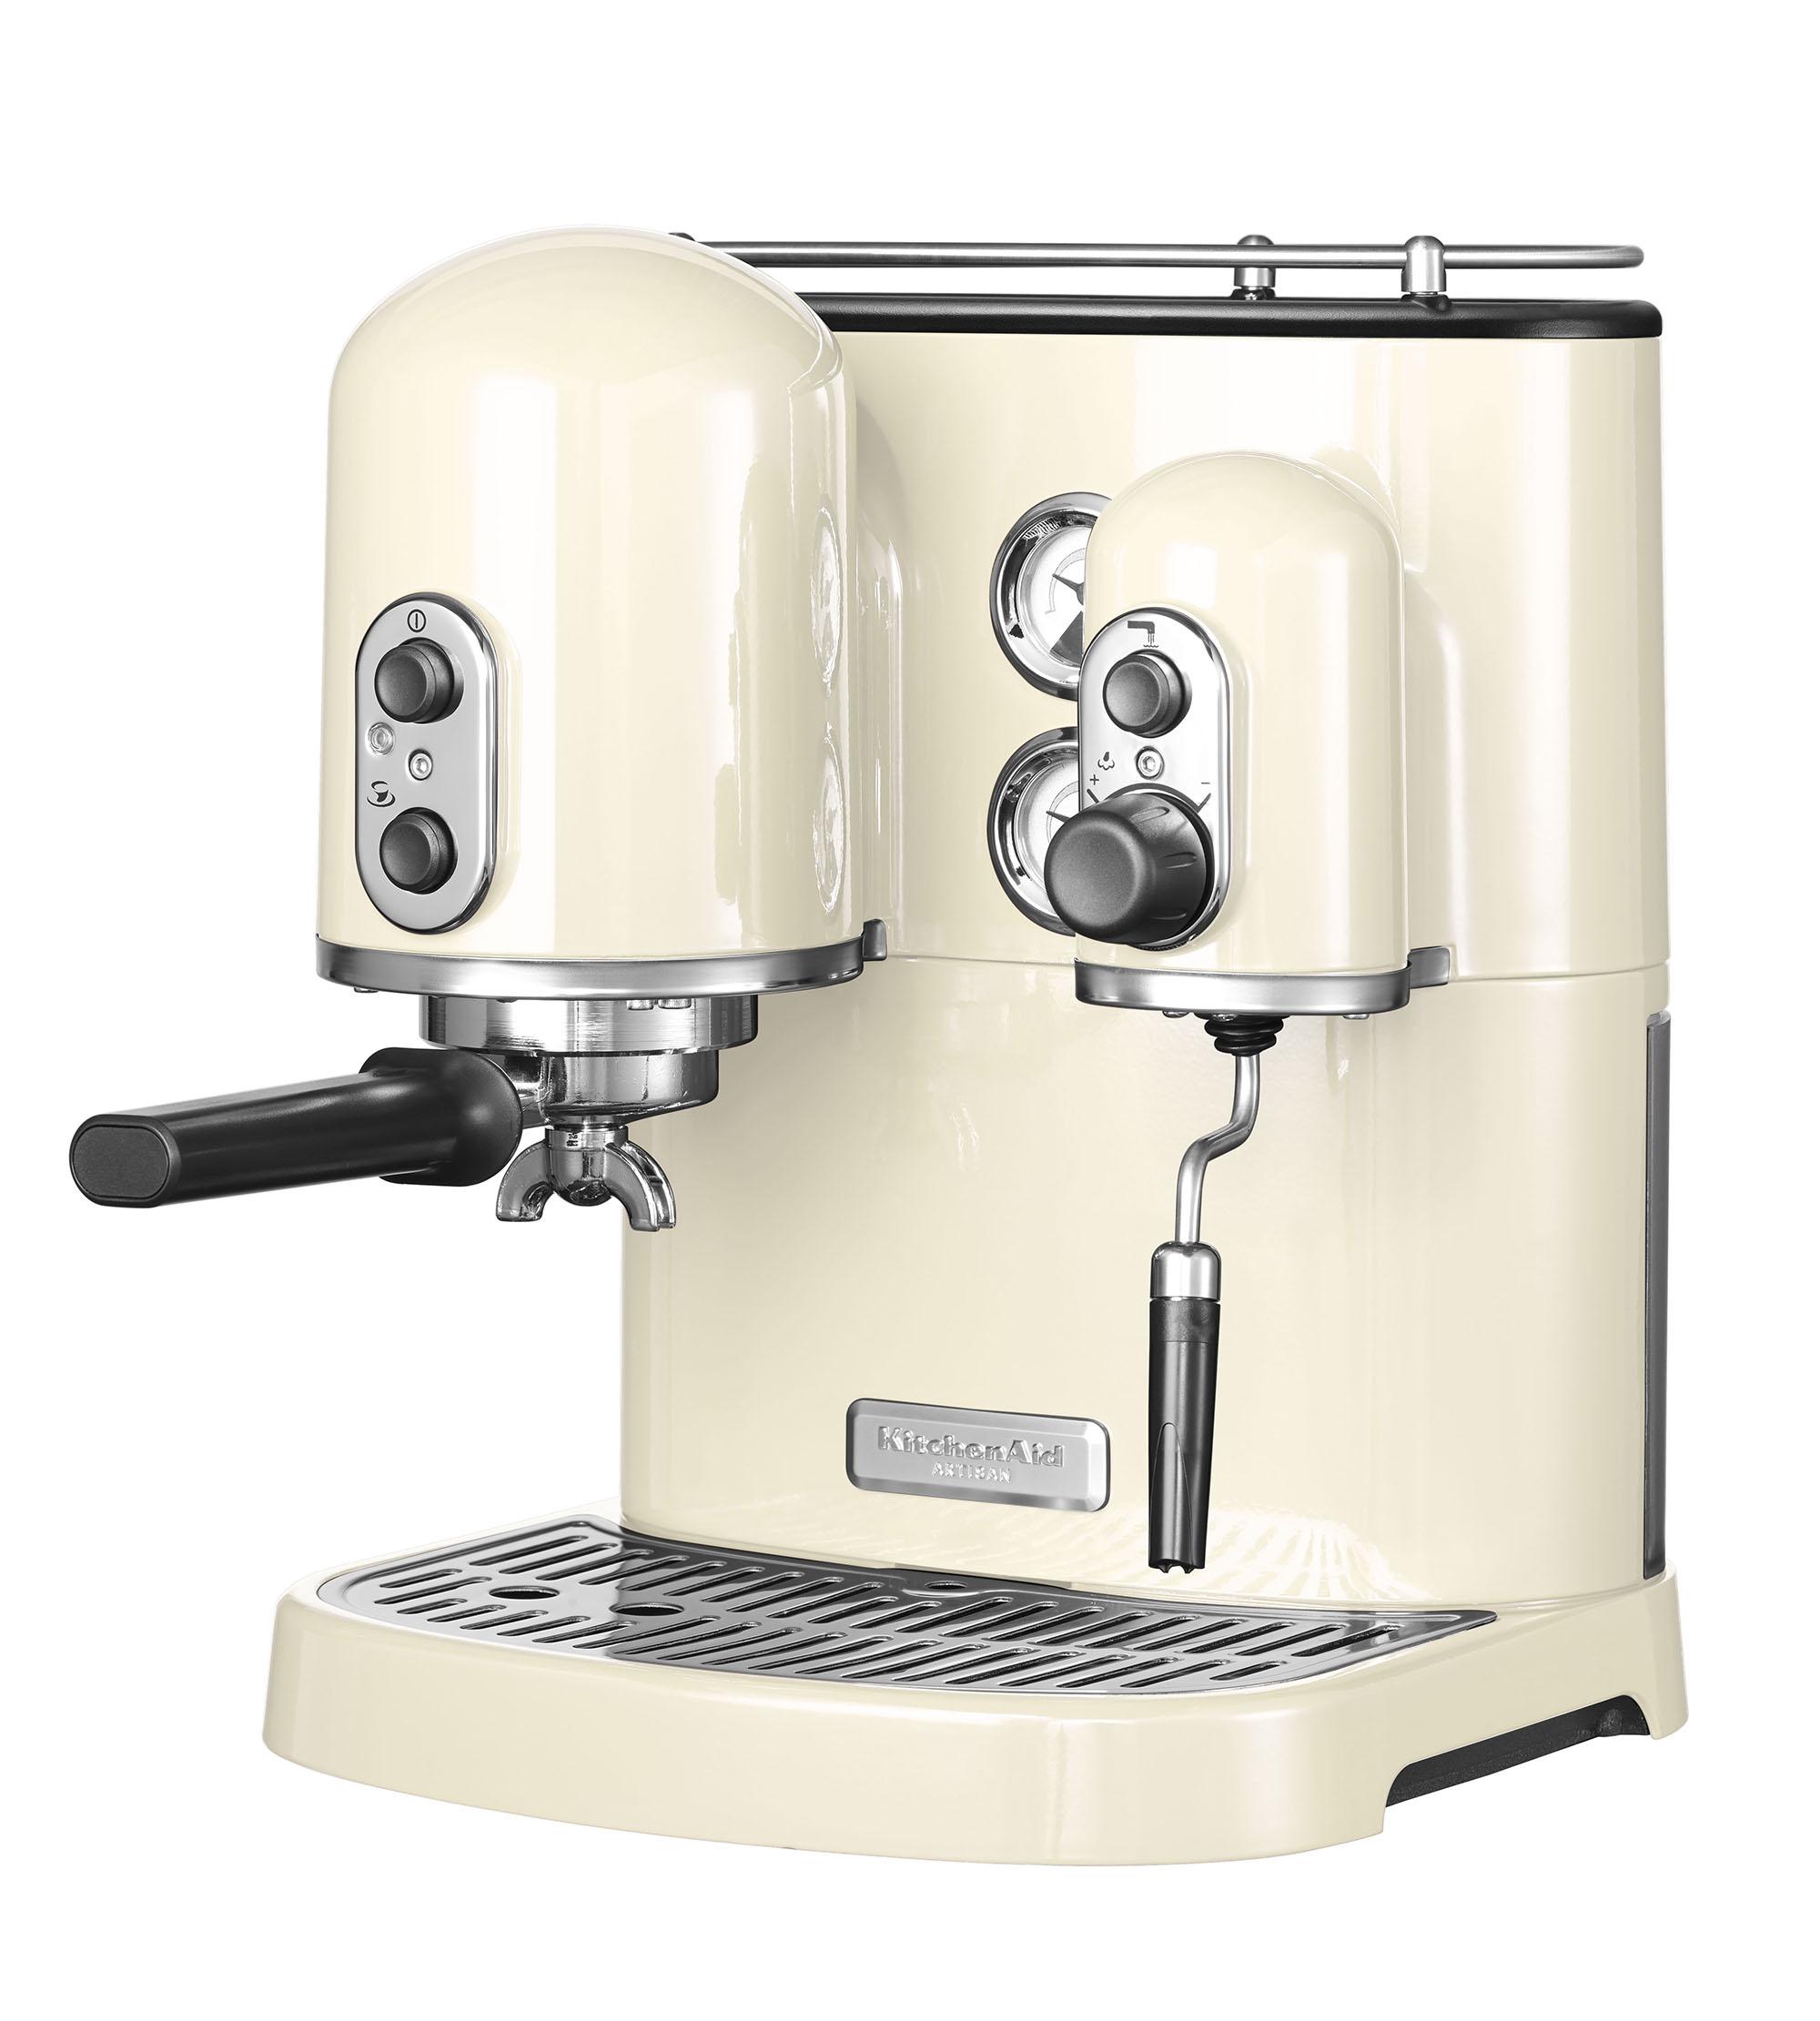 Kitchenaid Artisan Espressomaschine Kaffeegenuss